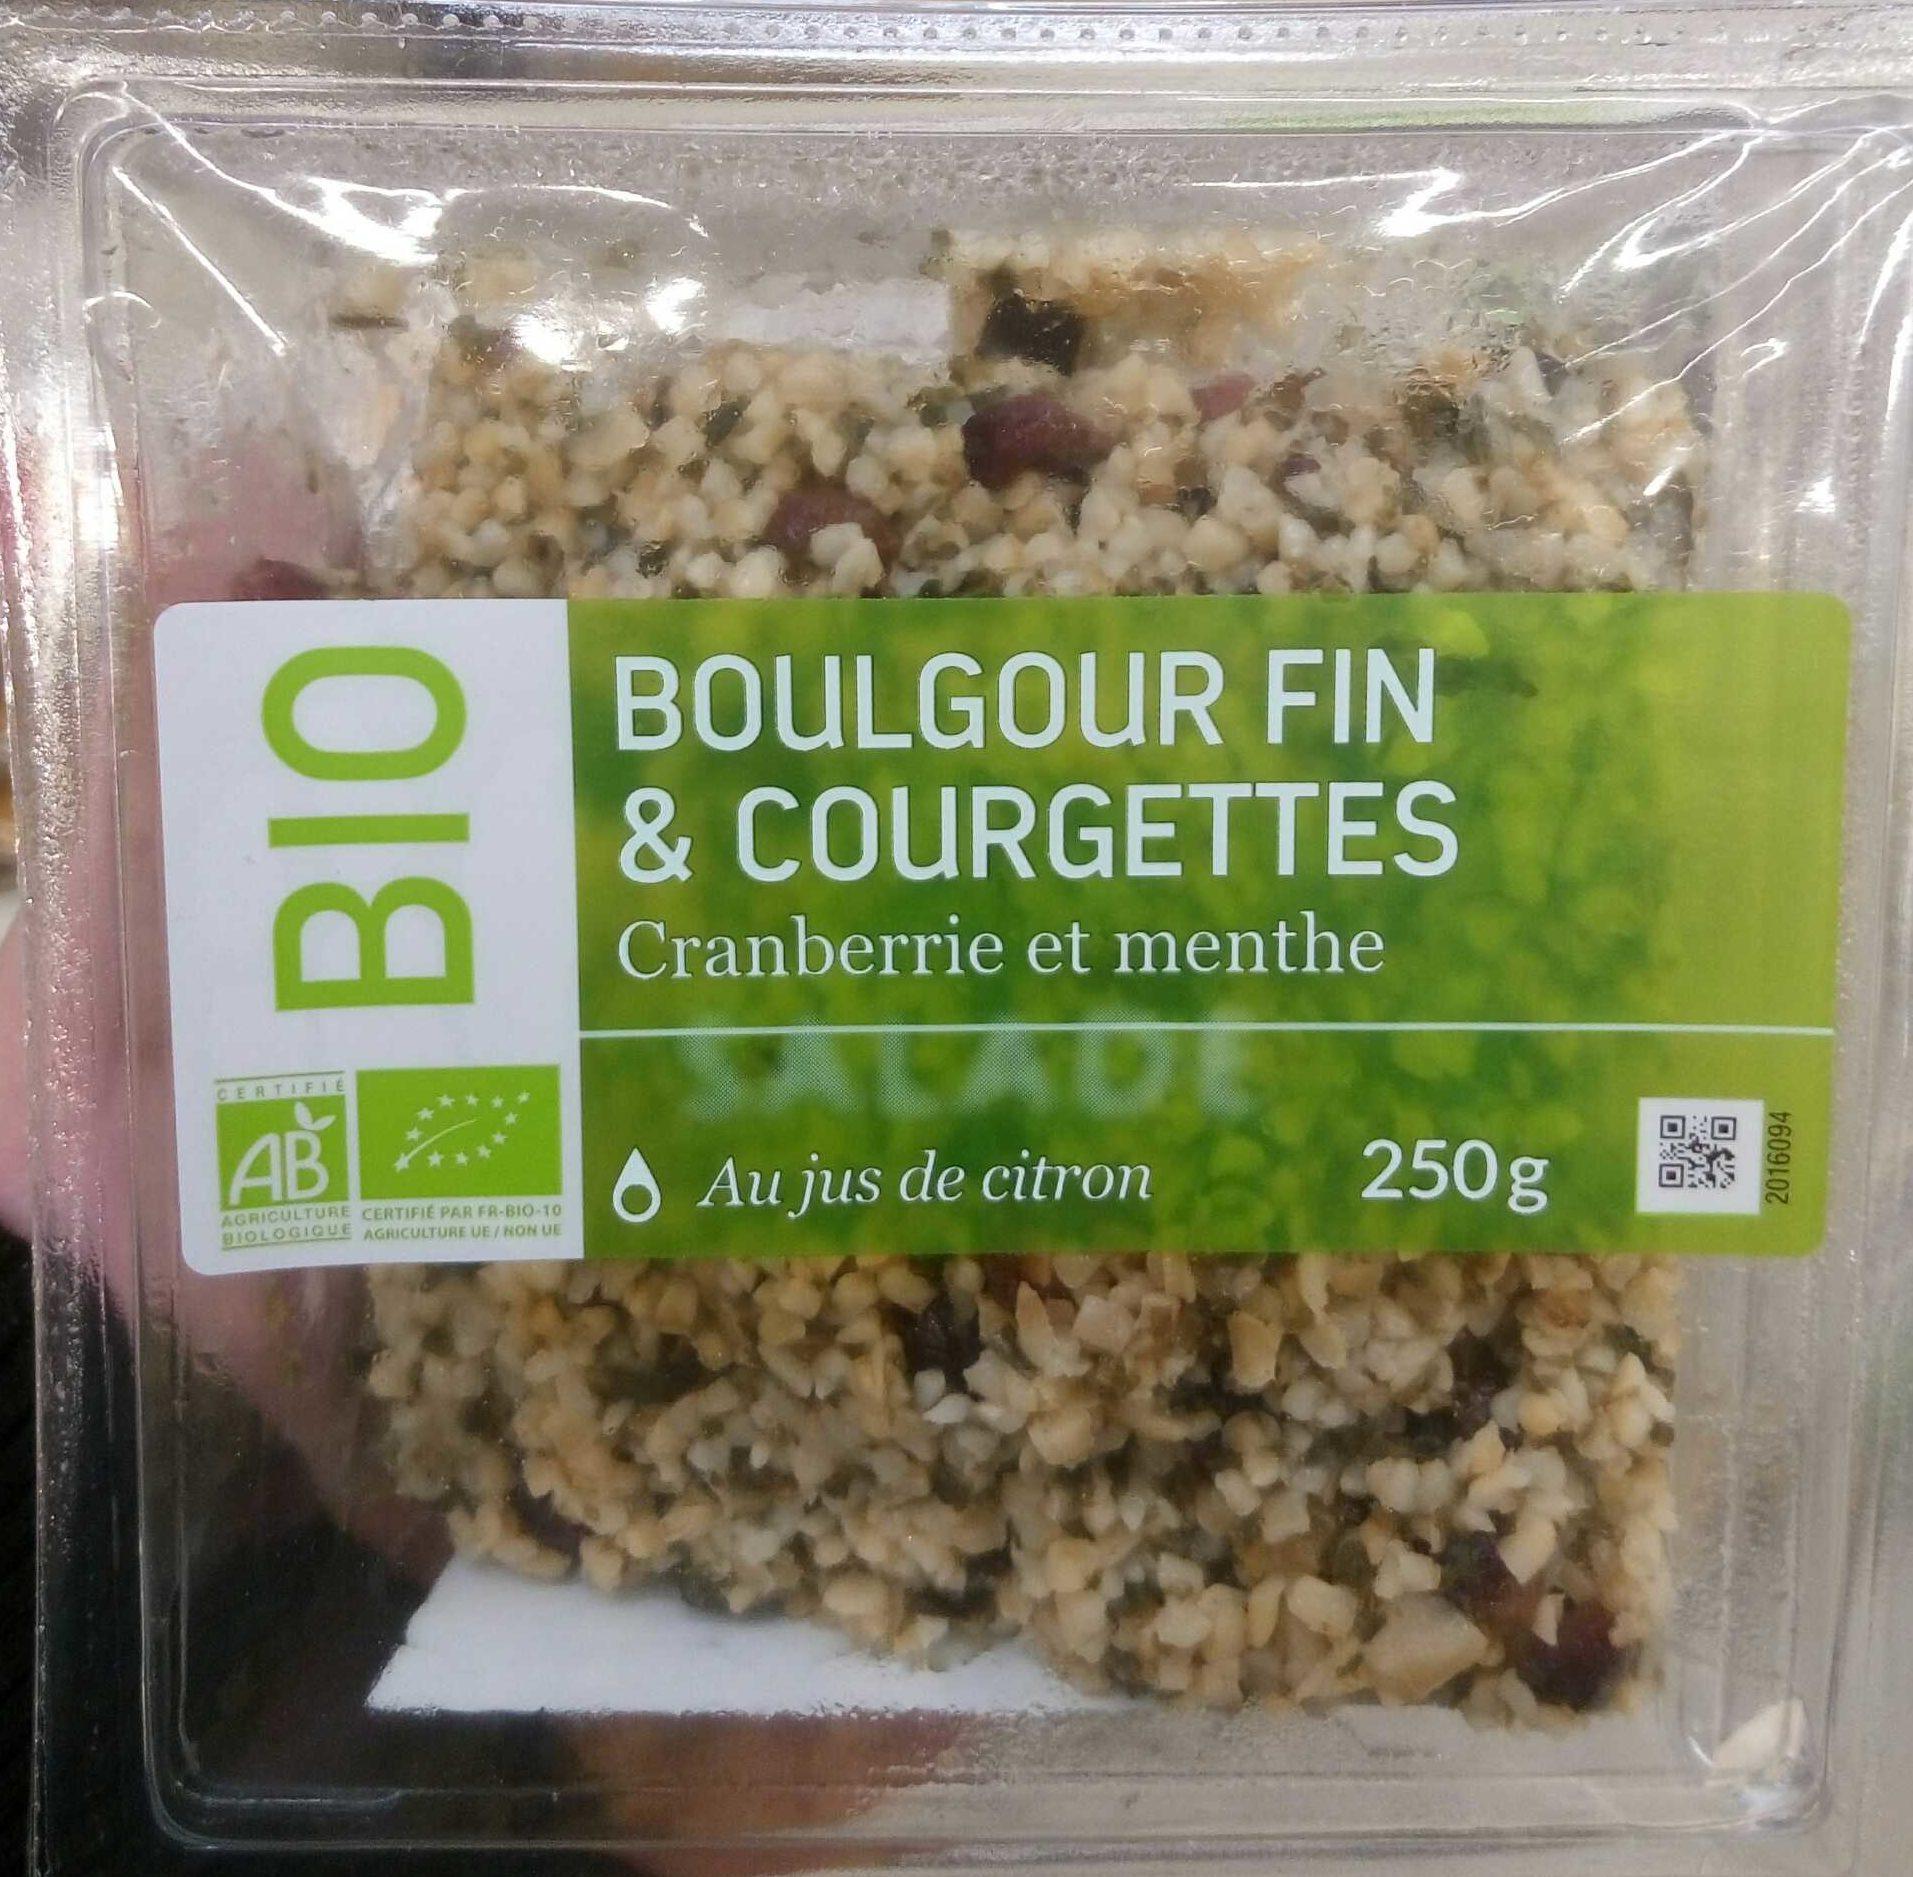 Salade de boulgour courgettes - Product